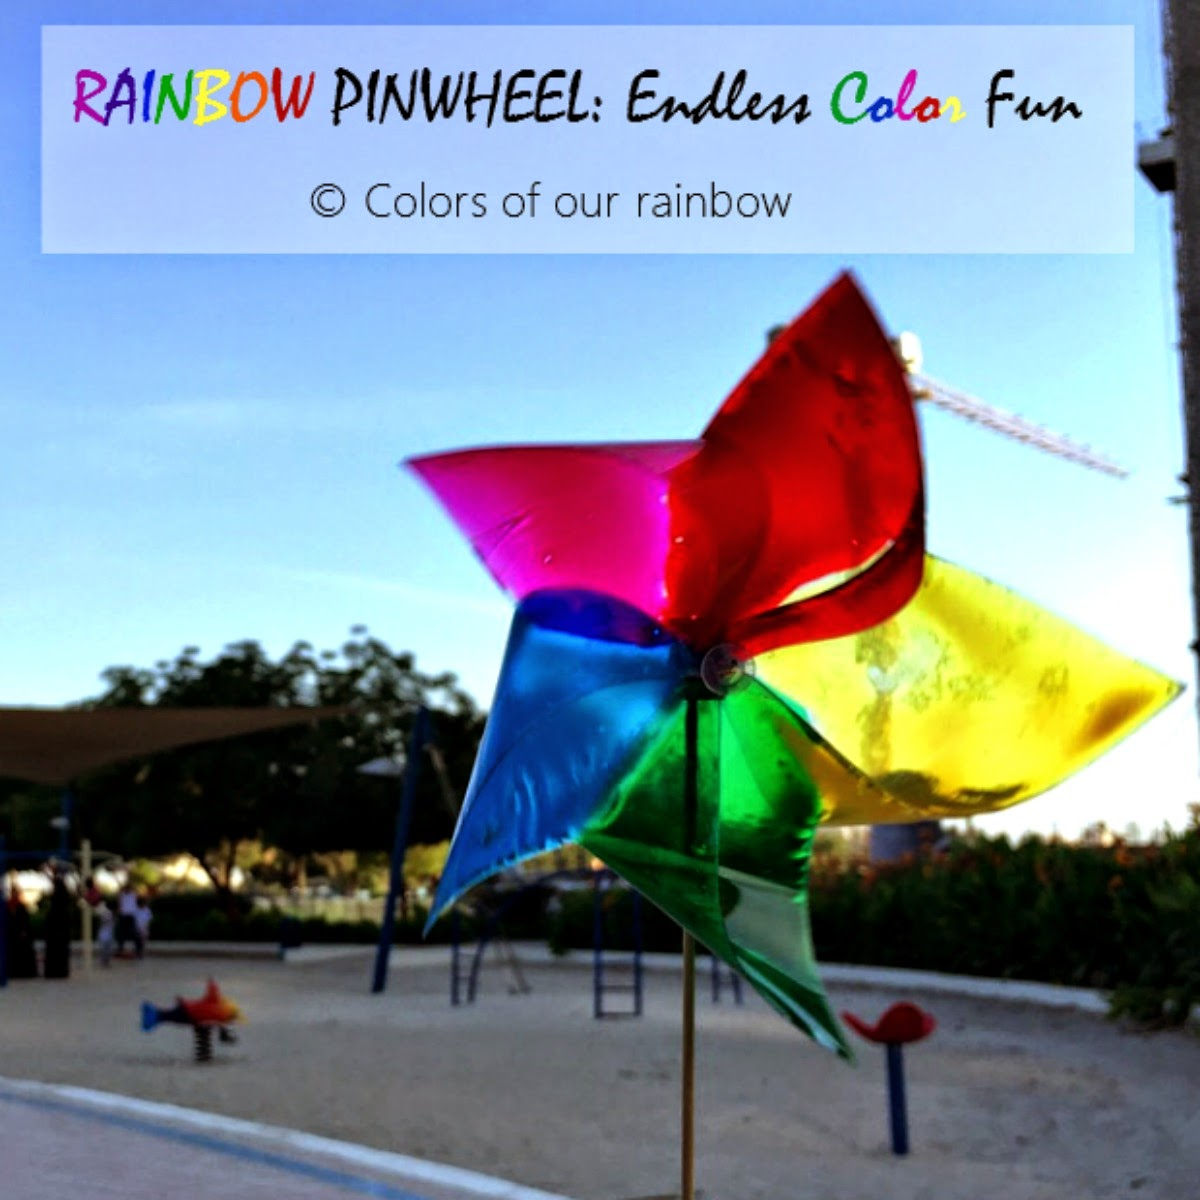 RAINBOW PINWHEEL: @colorsofourrainbow.blogspot.ae